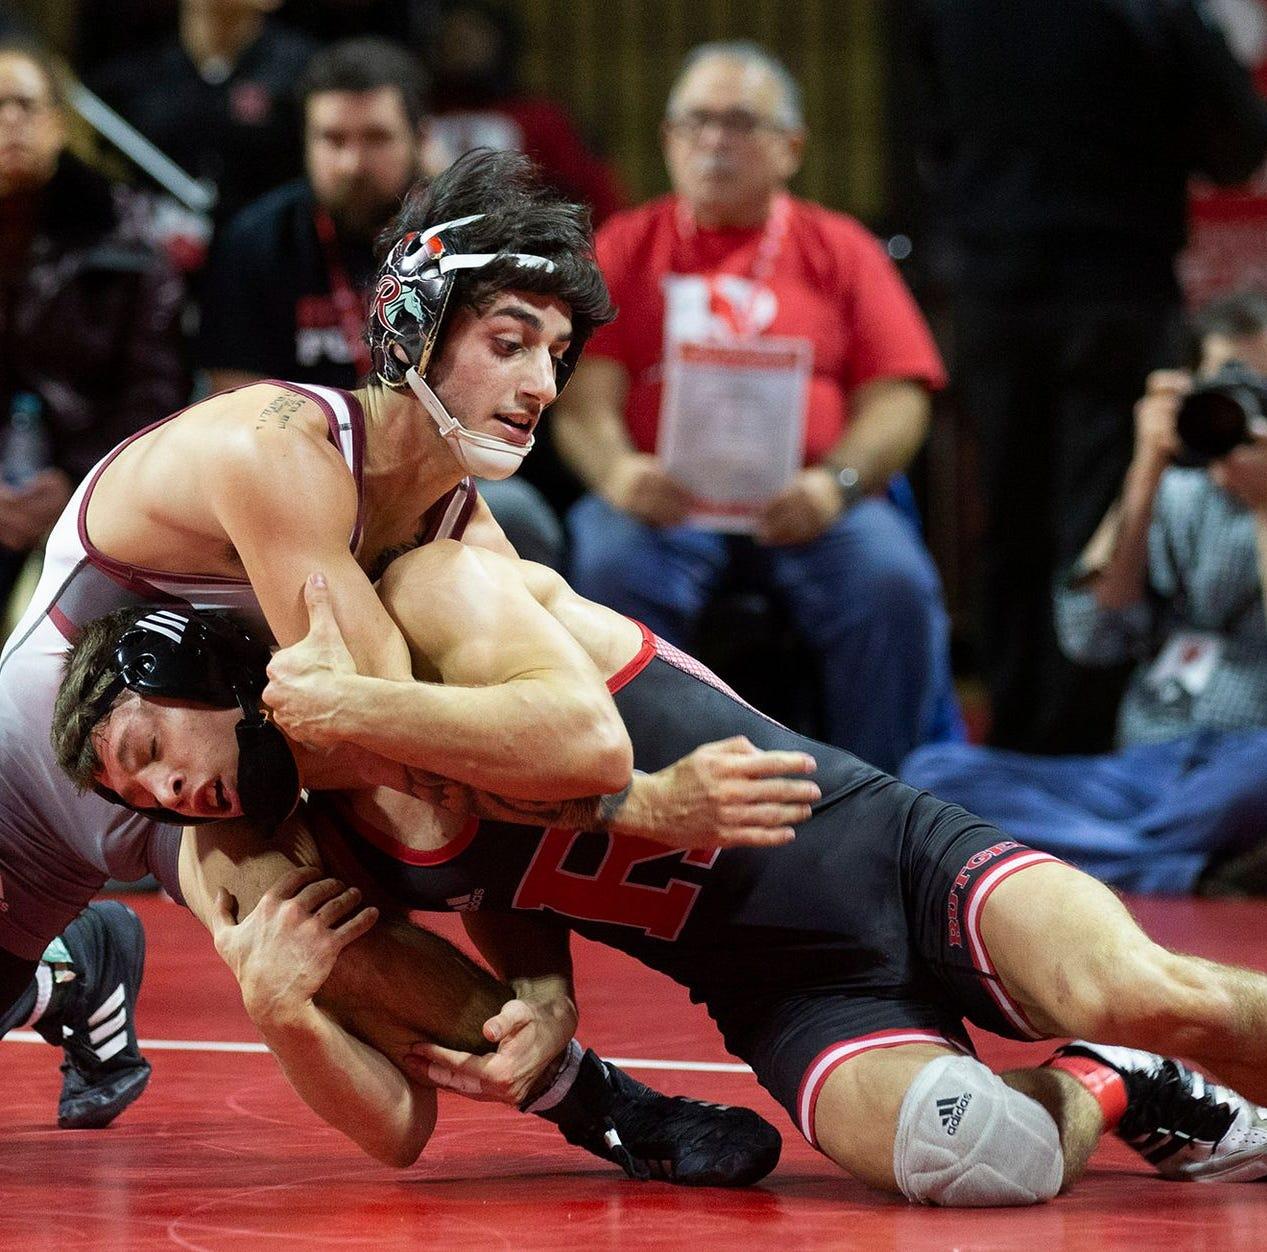 College wrestling: Rutgers edges Wisconsin on criteria